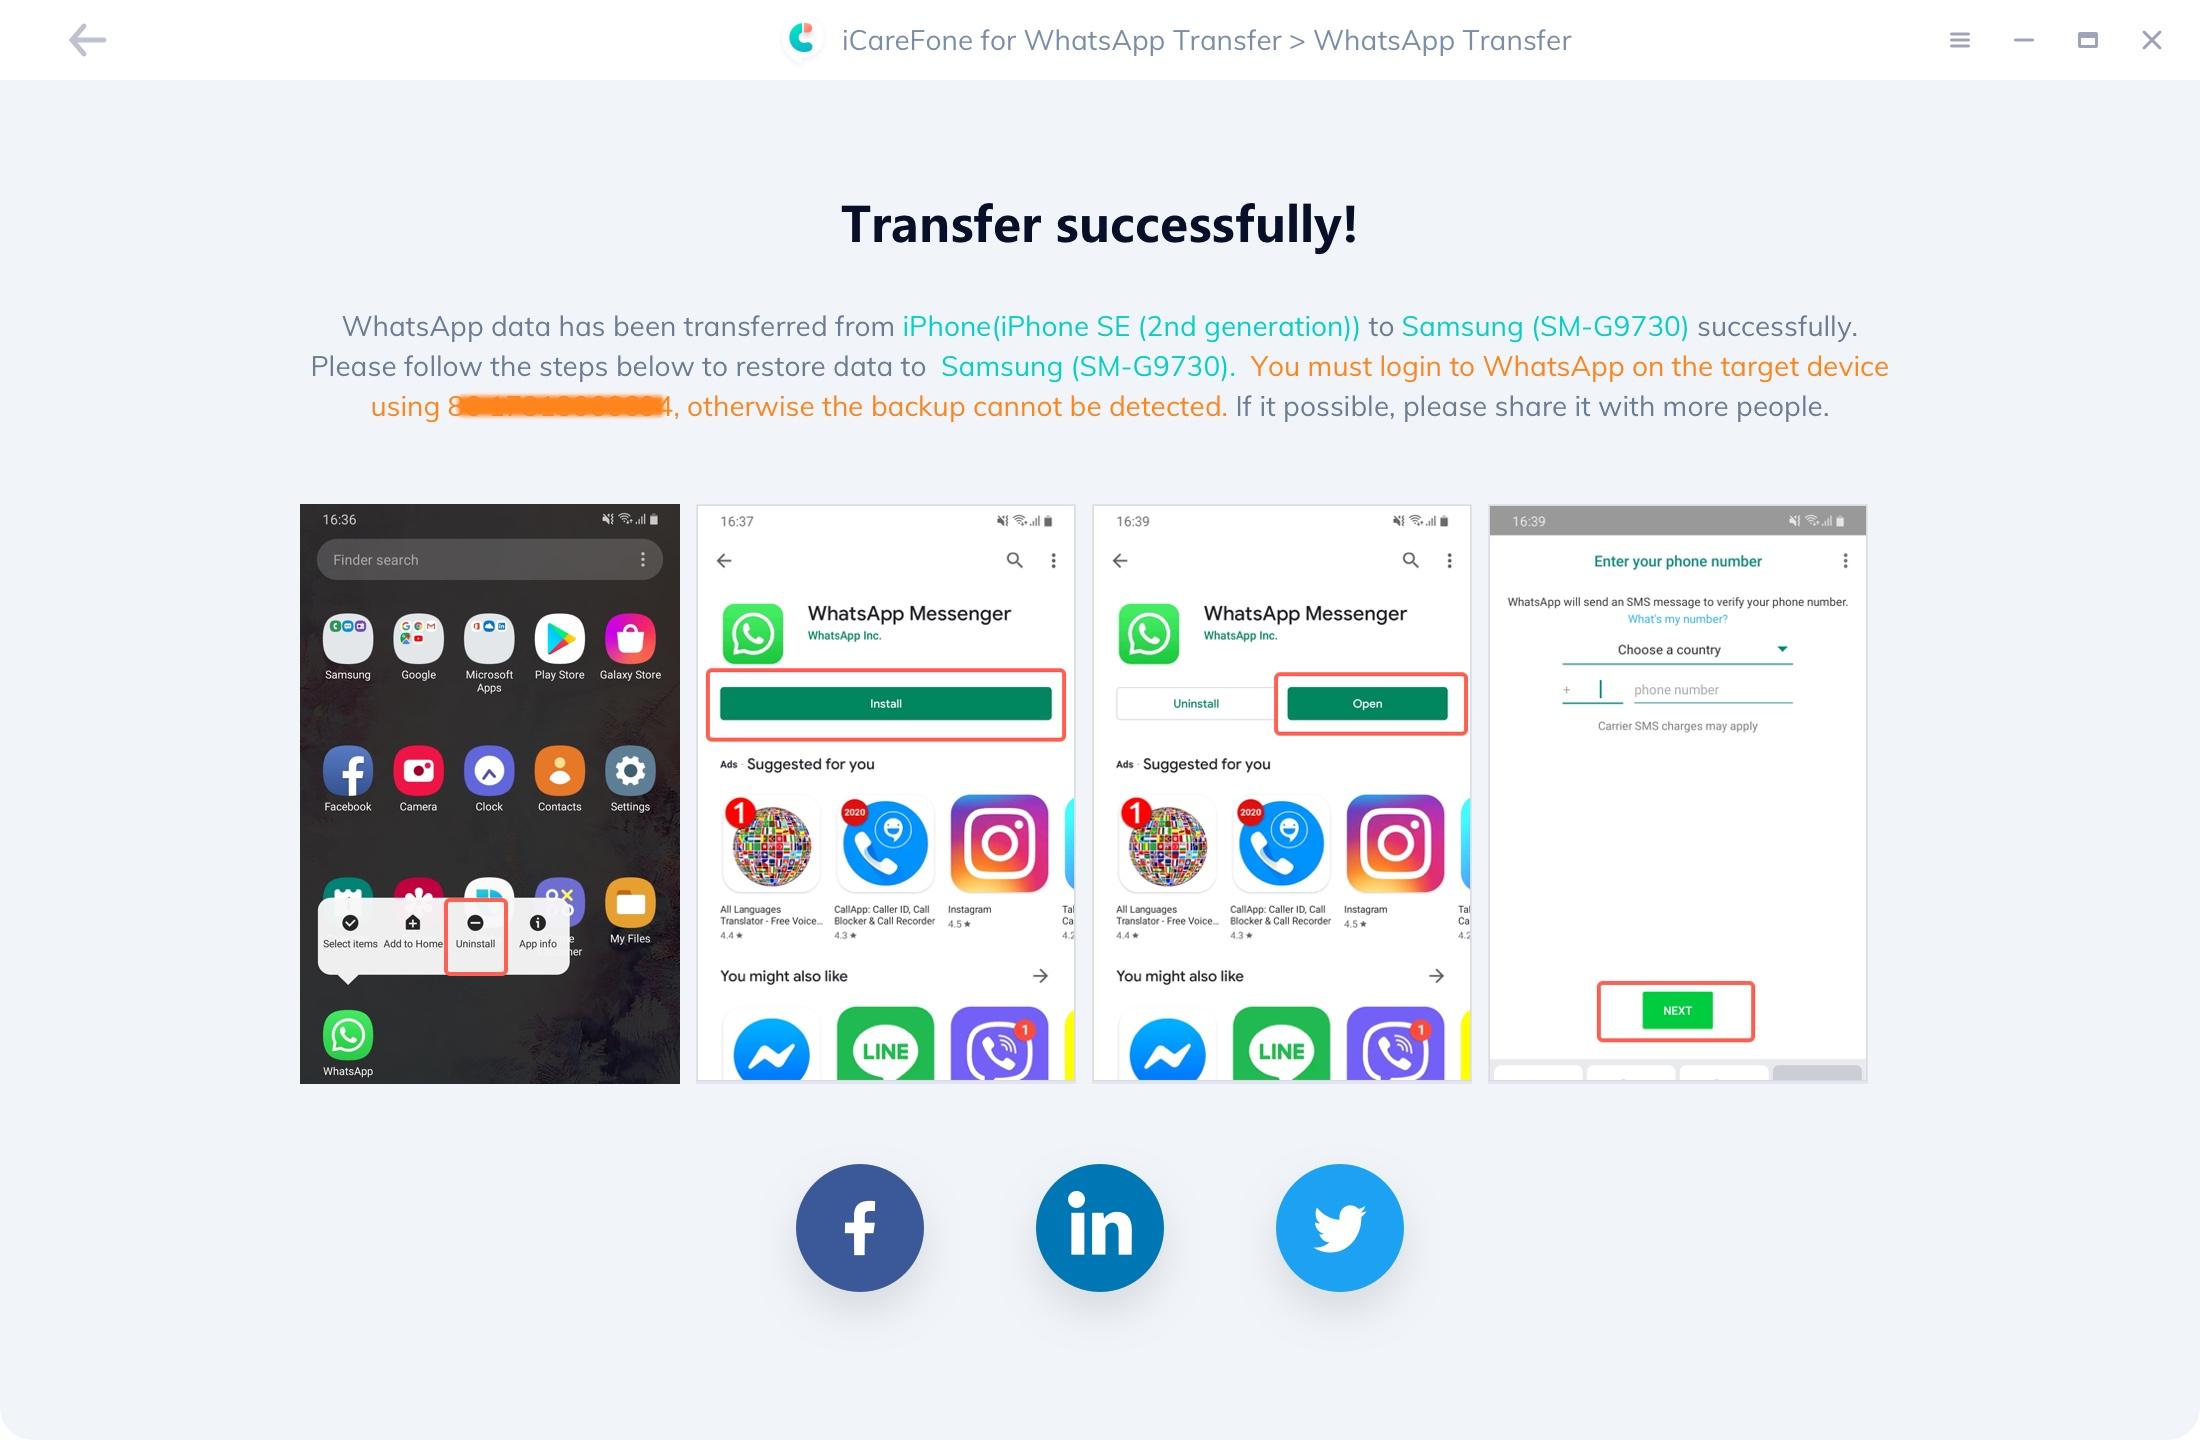 iCareFone Transfert WhatsApp réussi - guide